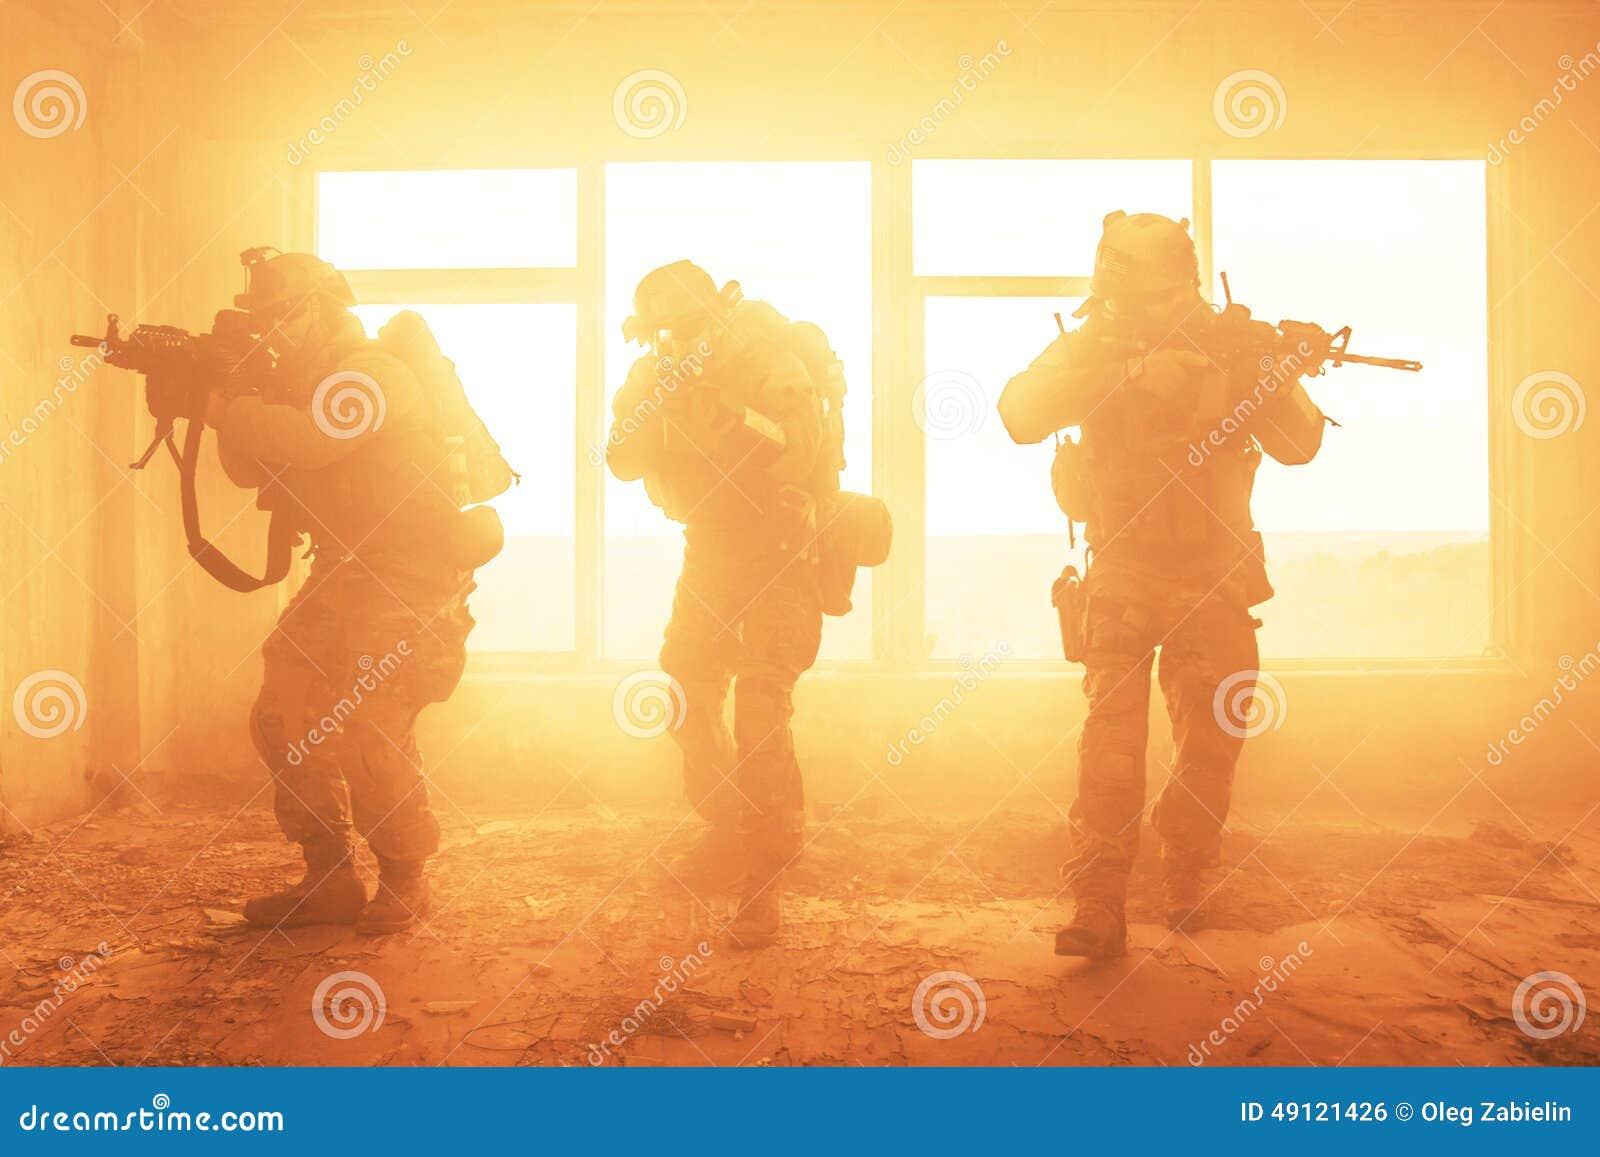 Rangers Ηνωμένου στρατού στη δράση